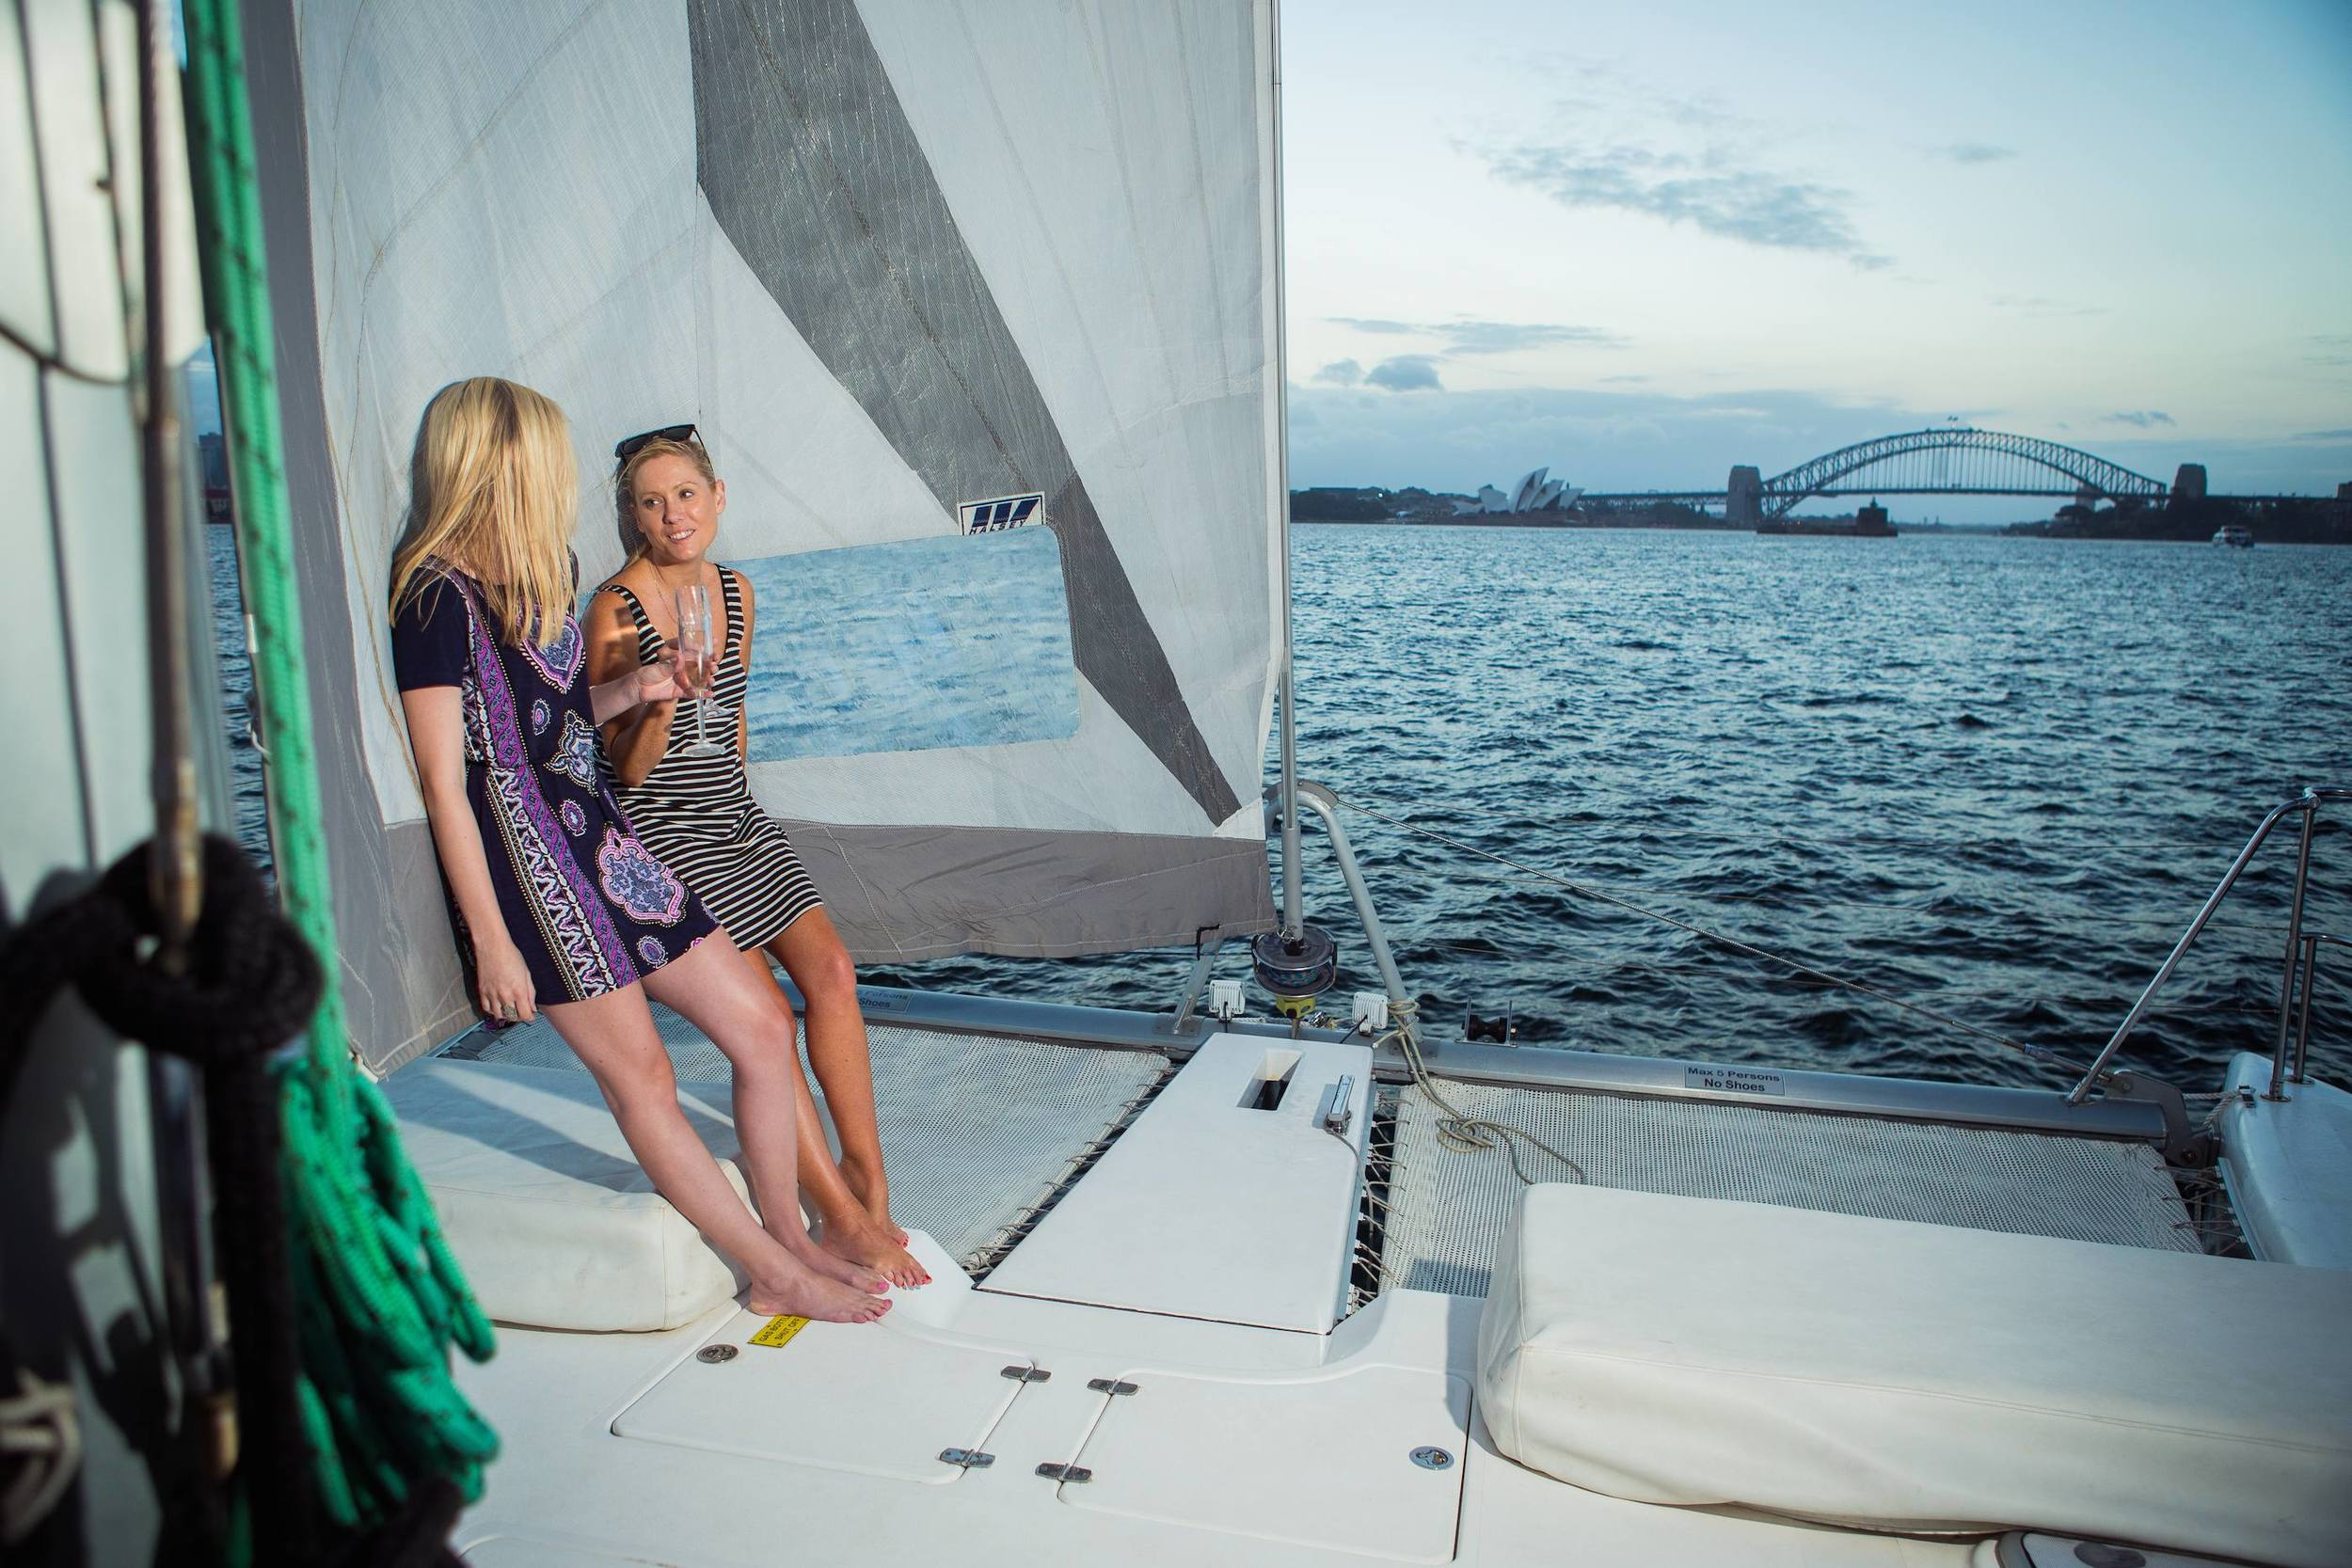 Barefoot Girls on Headsail Boat022.jpeg